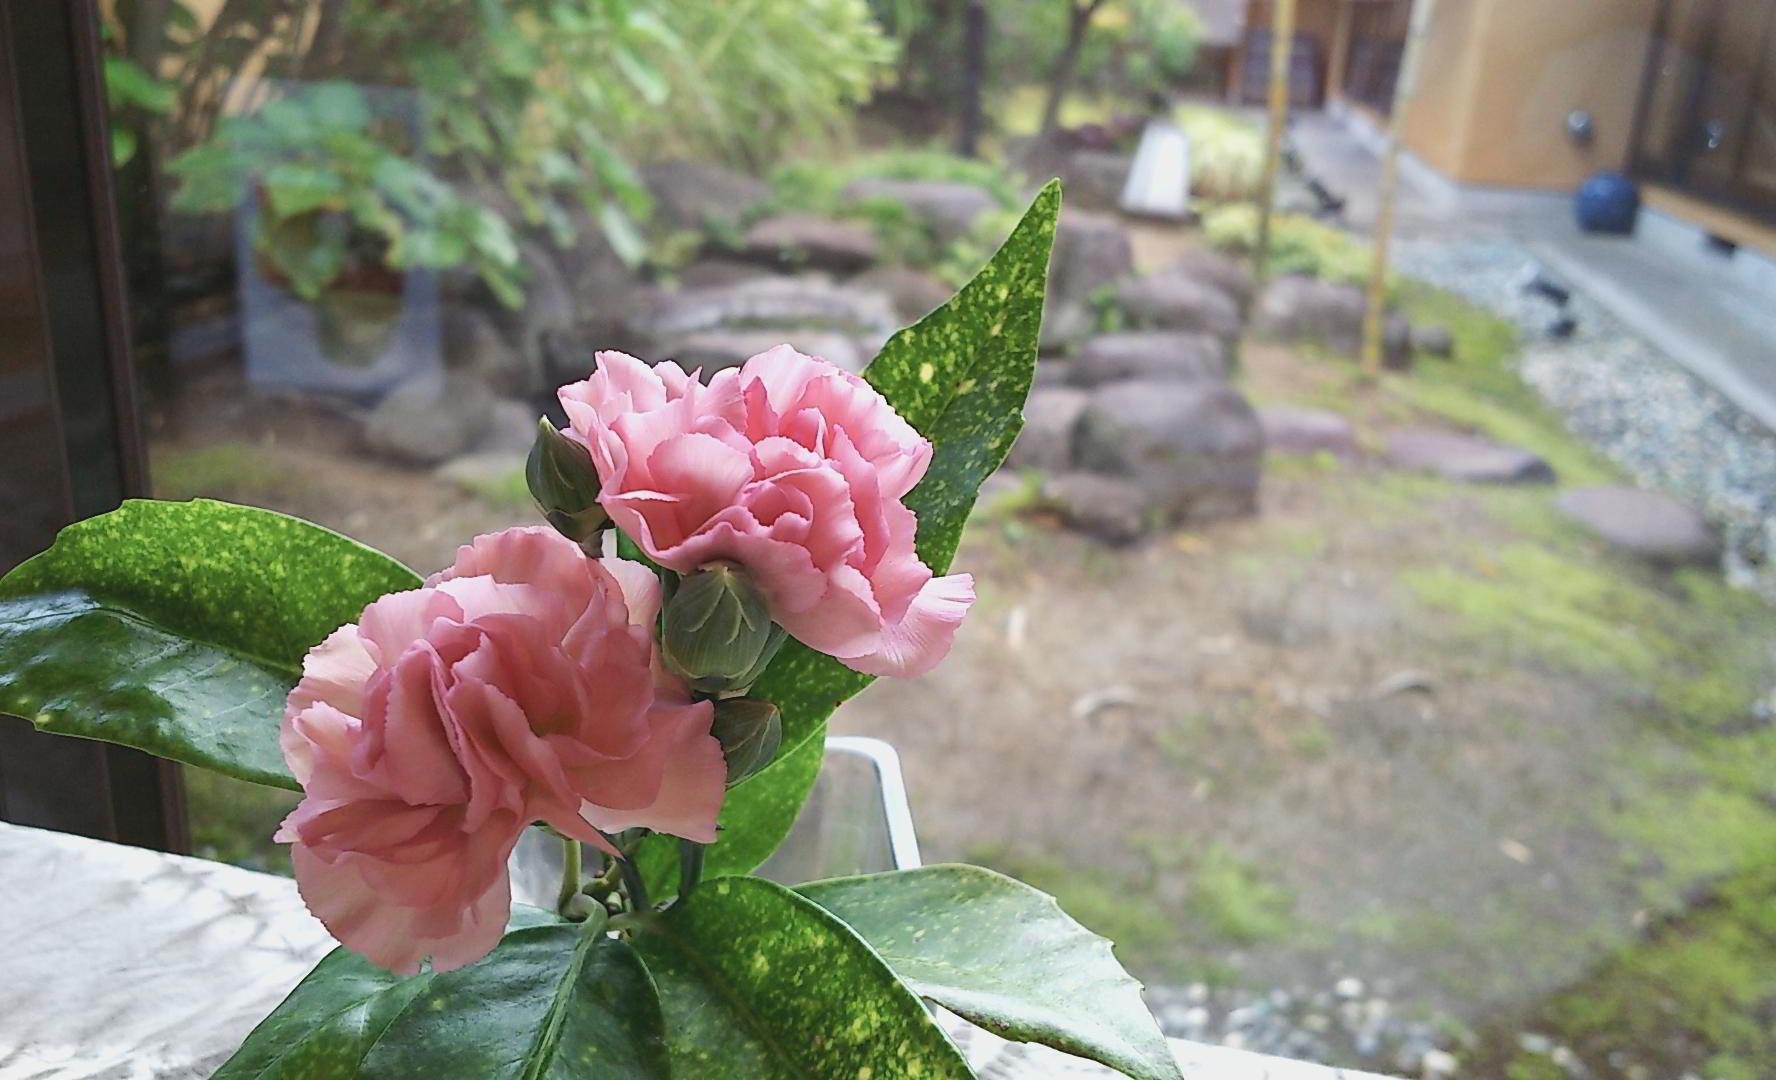 http://www.tomihiro.co.jp/blog/2019/09/12/IMG_20190912_103230283.jpg